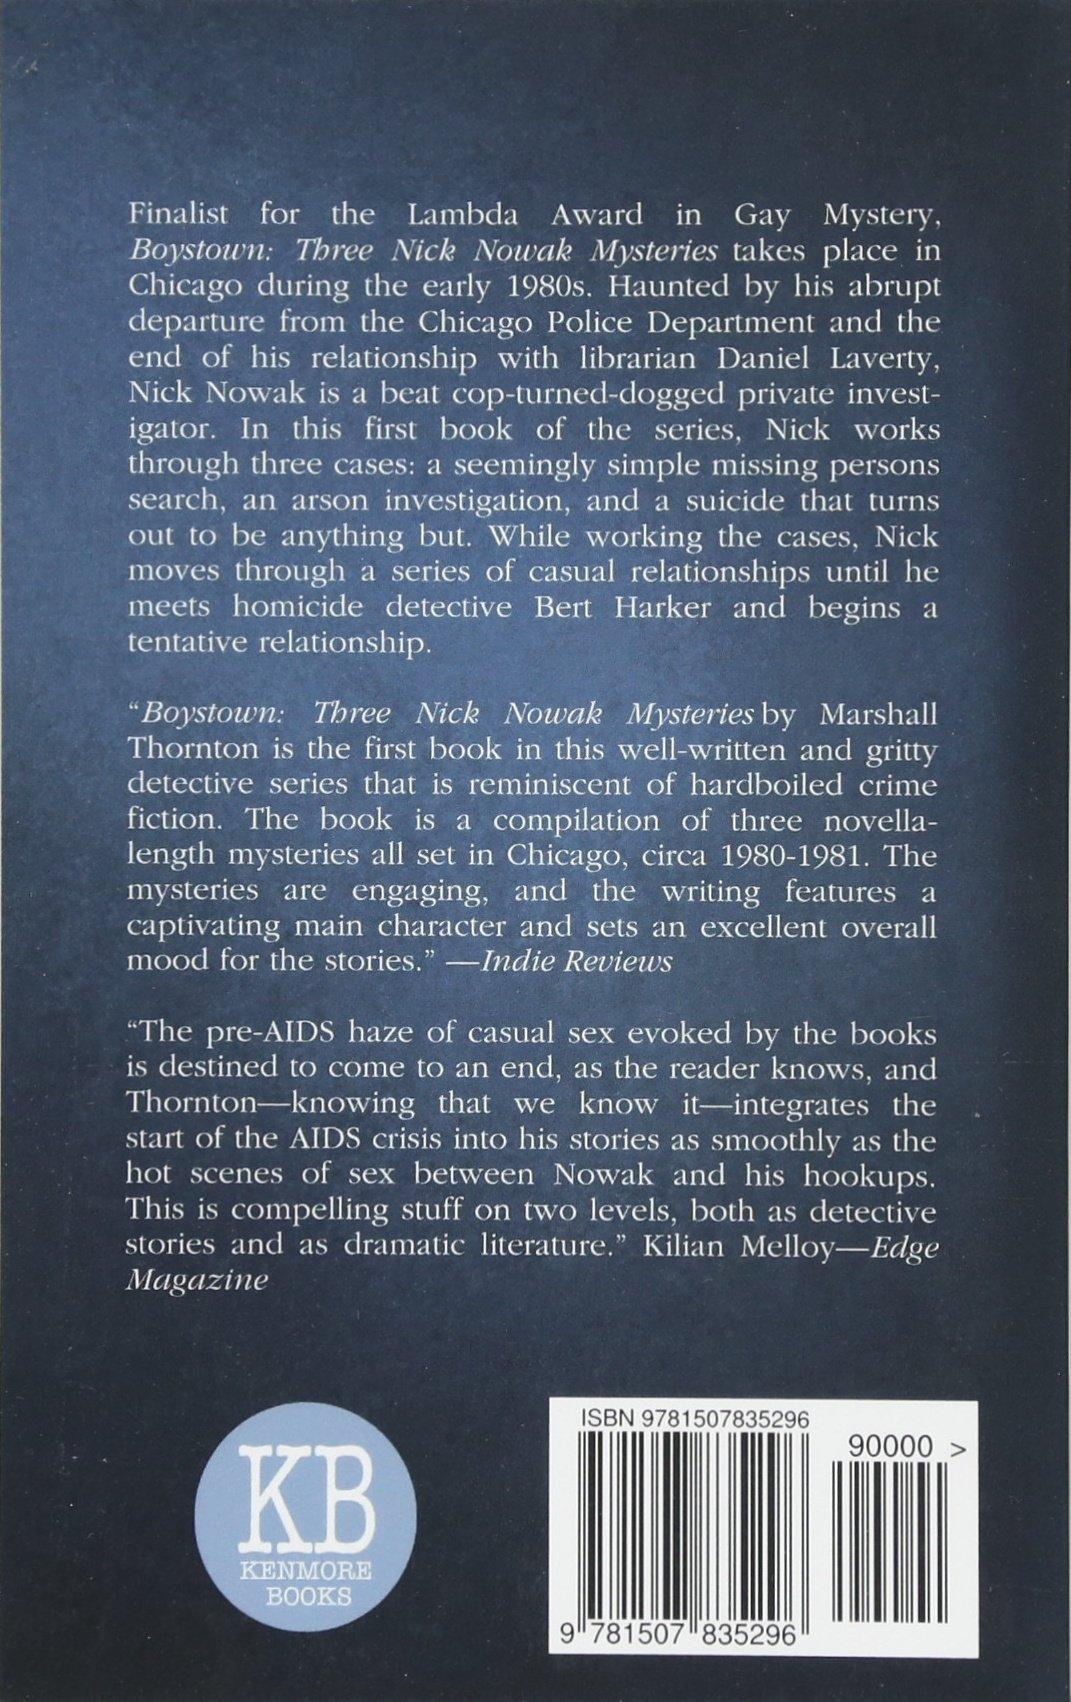 Amazon.com: Boystown : Three Nick Nowak Mysteries (Boystown Mysteries)  (Volume 1) (9781507835296): Marshall Thornton: Books